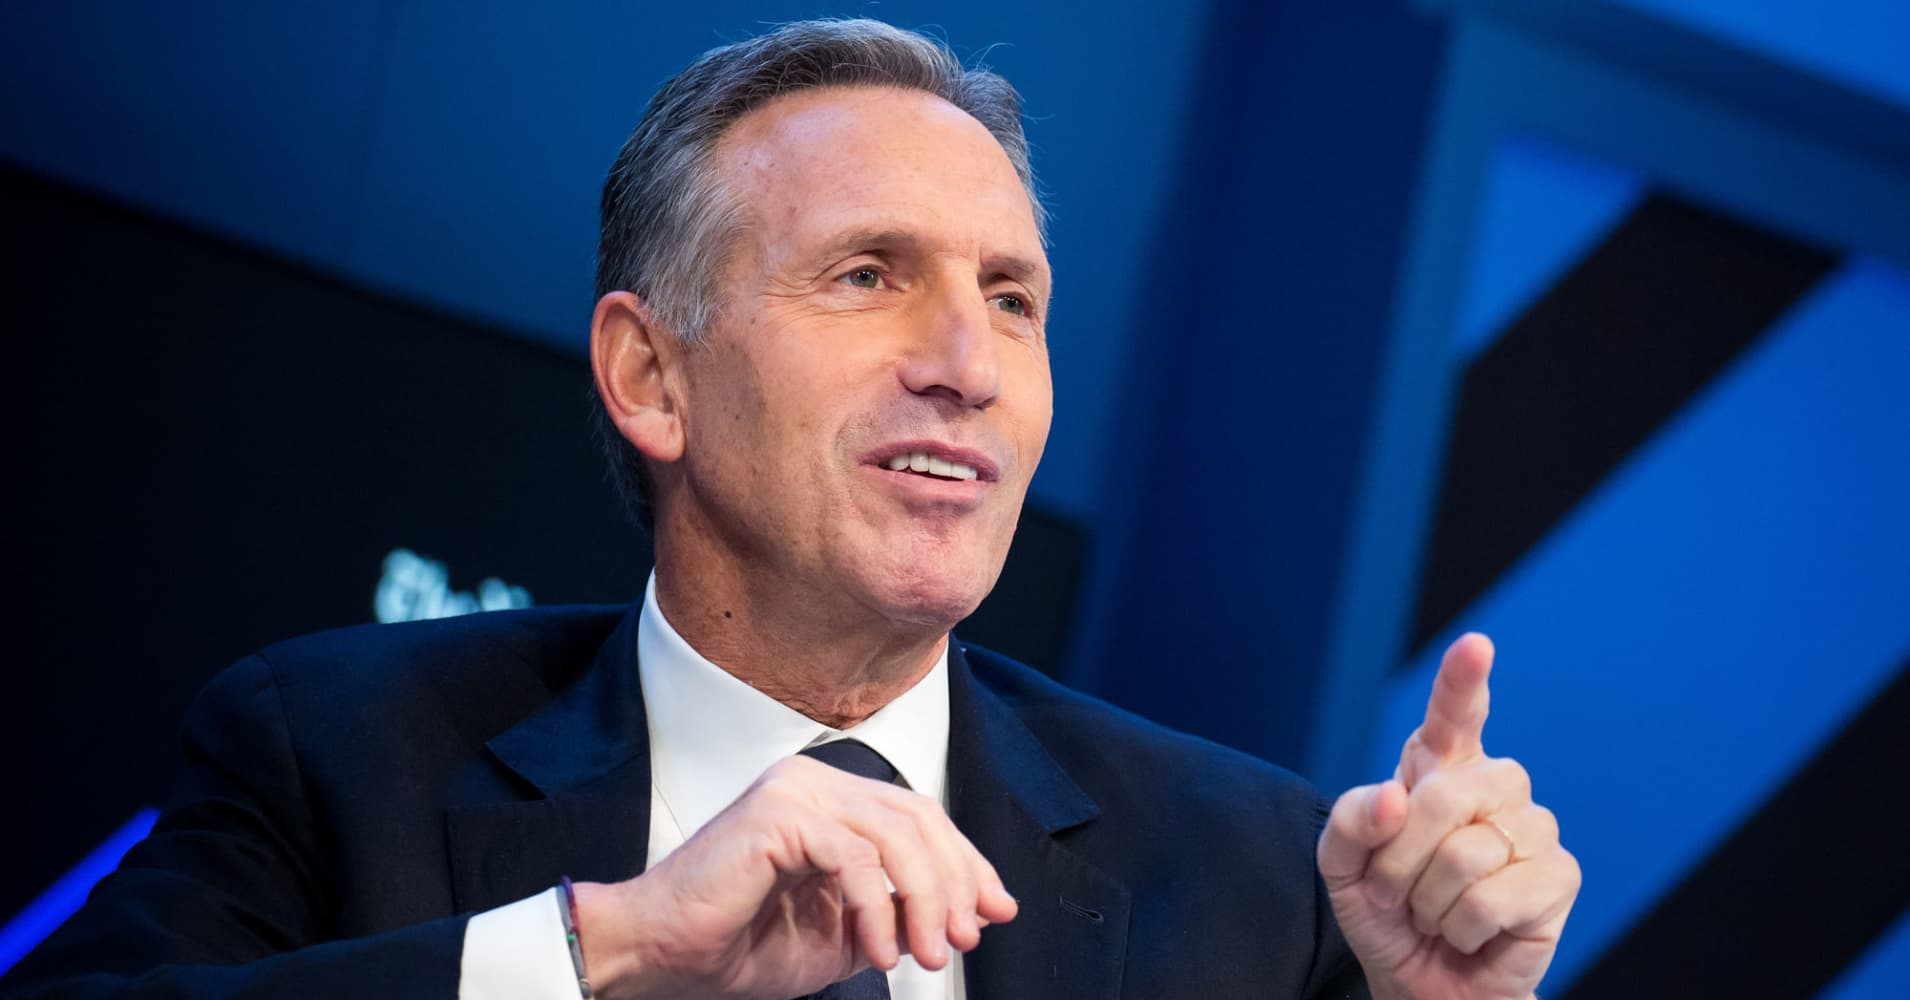 Former Starbucks CEO Howard Schultz weighs independent bid for presidency, denounces 'revenge politics'